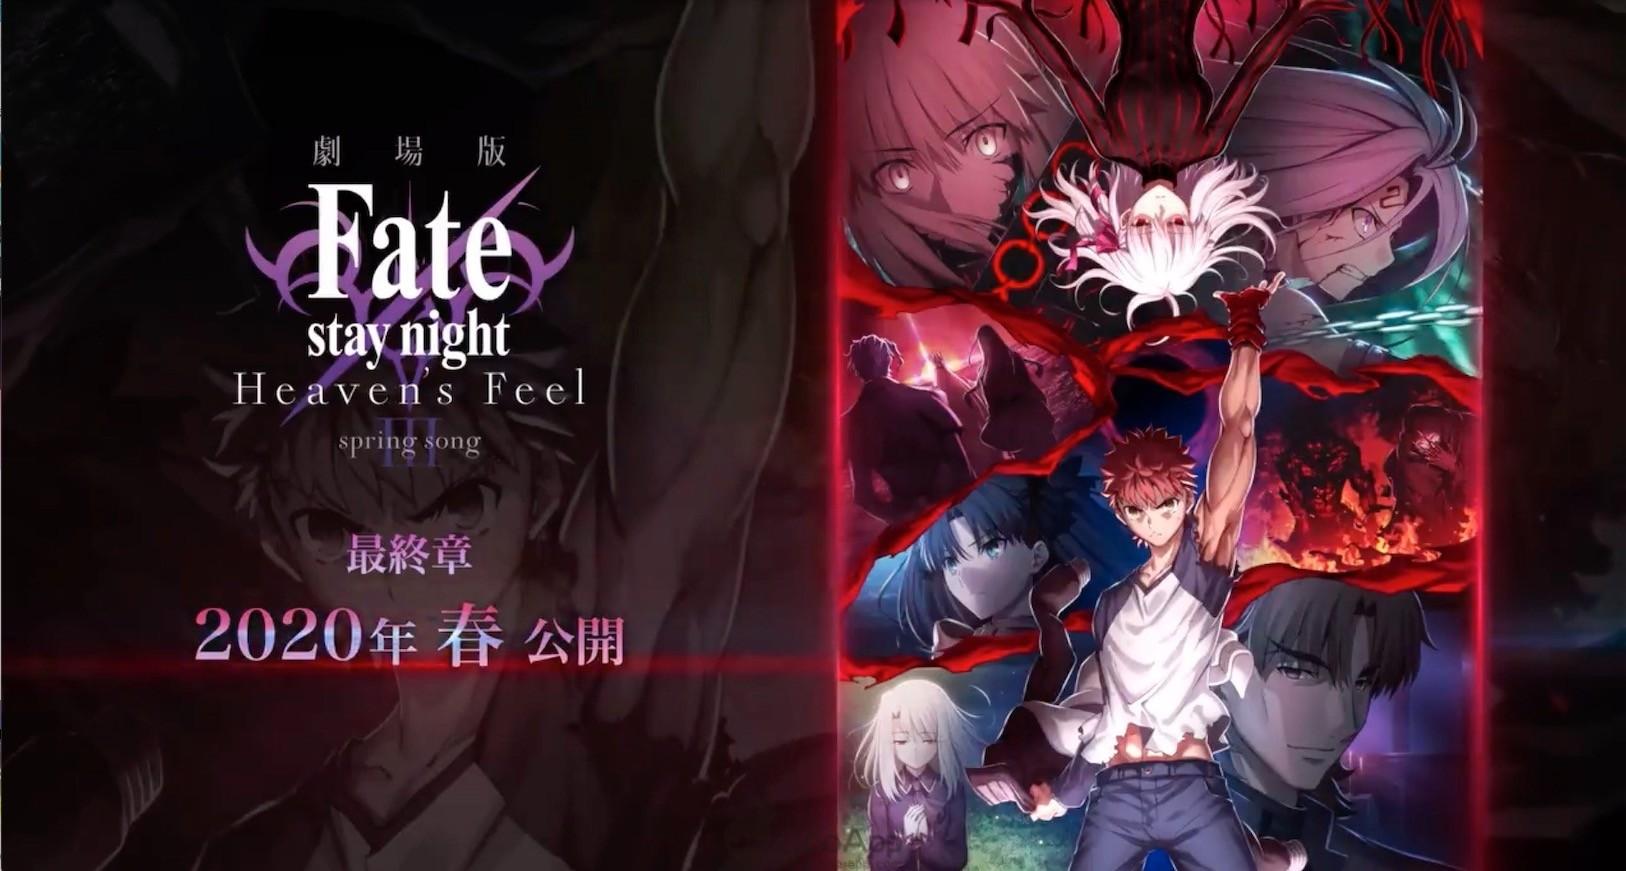 Fate Stay Night Heavens Feel 3 เฟด สเตย์ ไนท์ เฮเว่น ฟีล 3